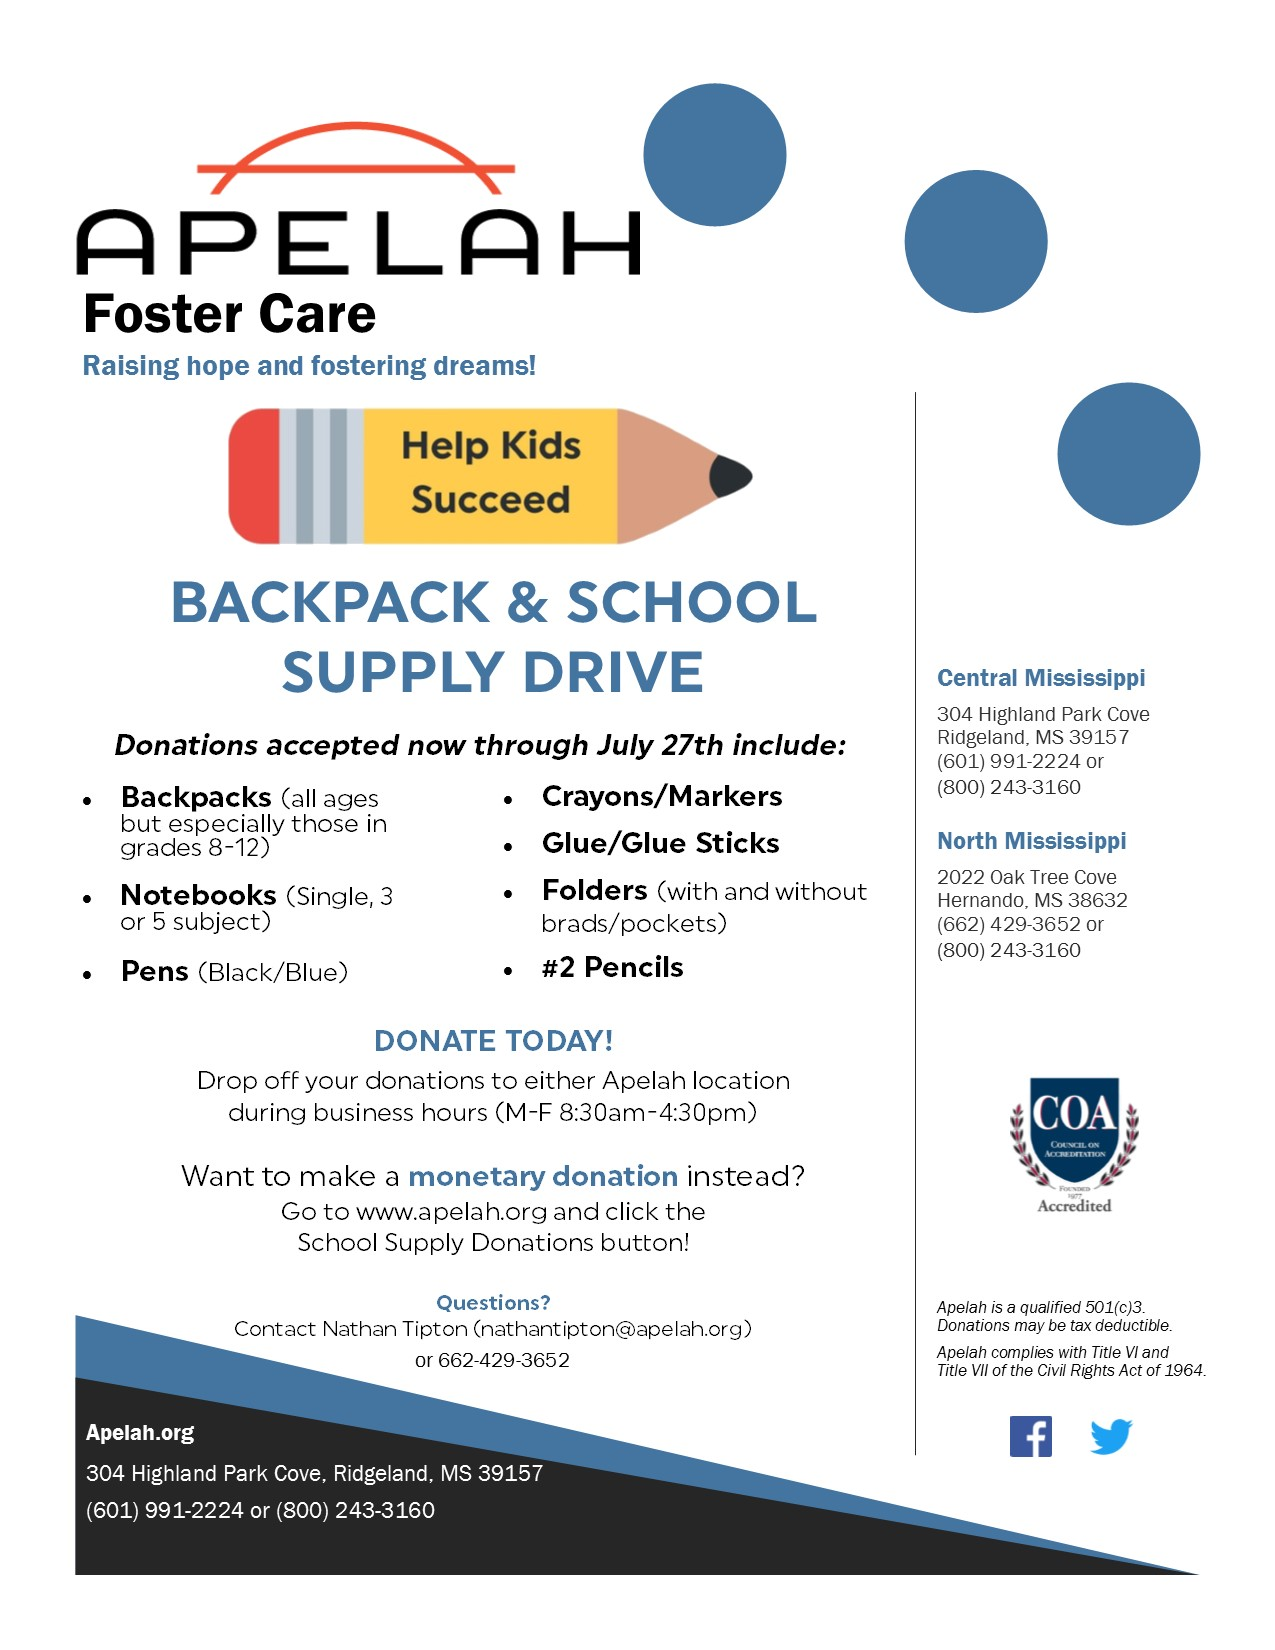 Apelah 2018 Backpack drive.jpg